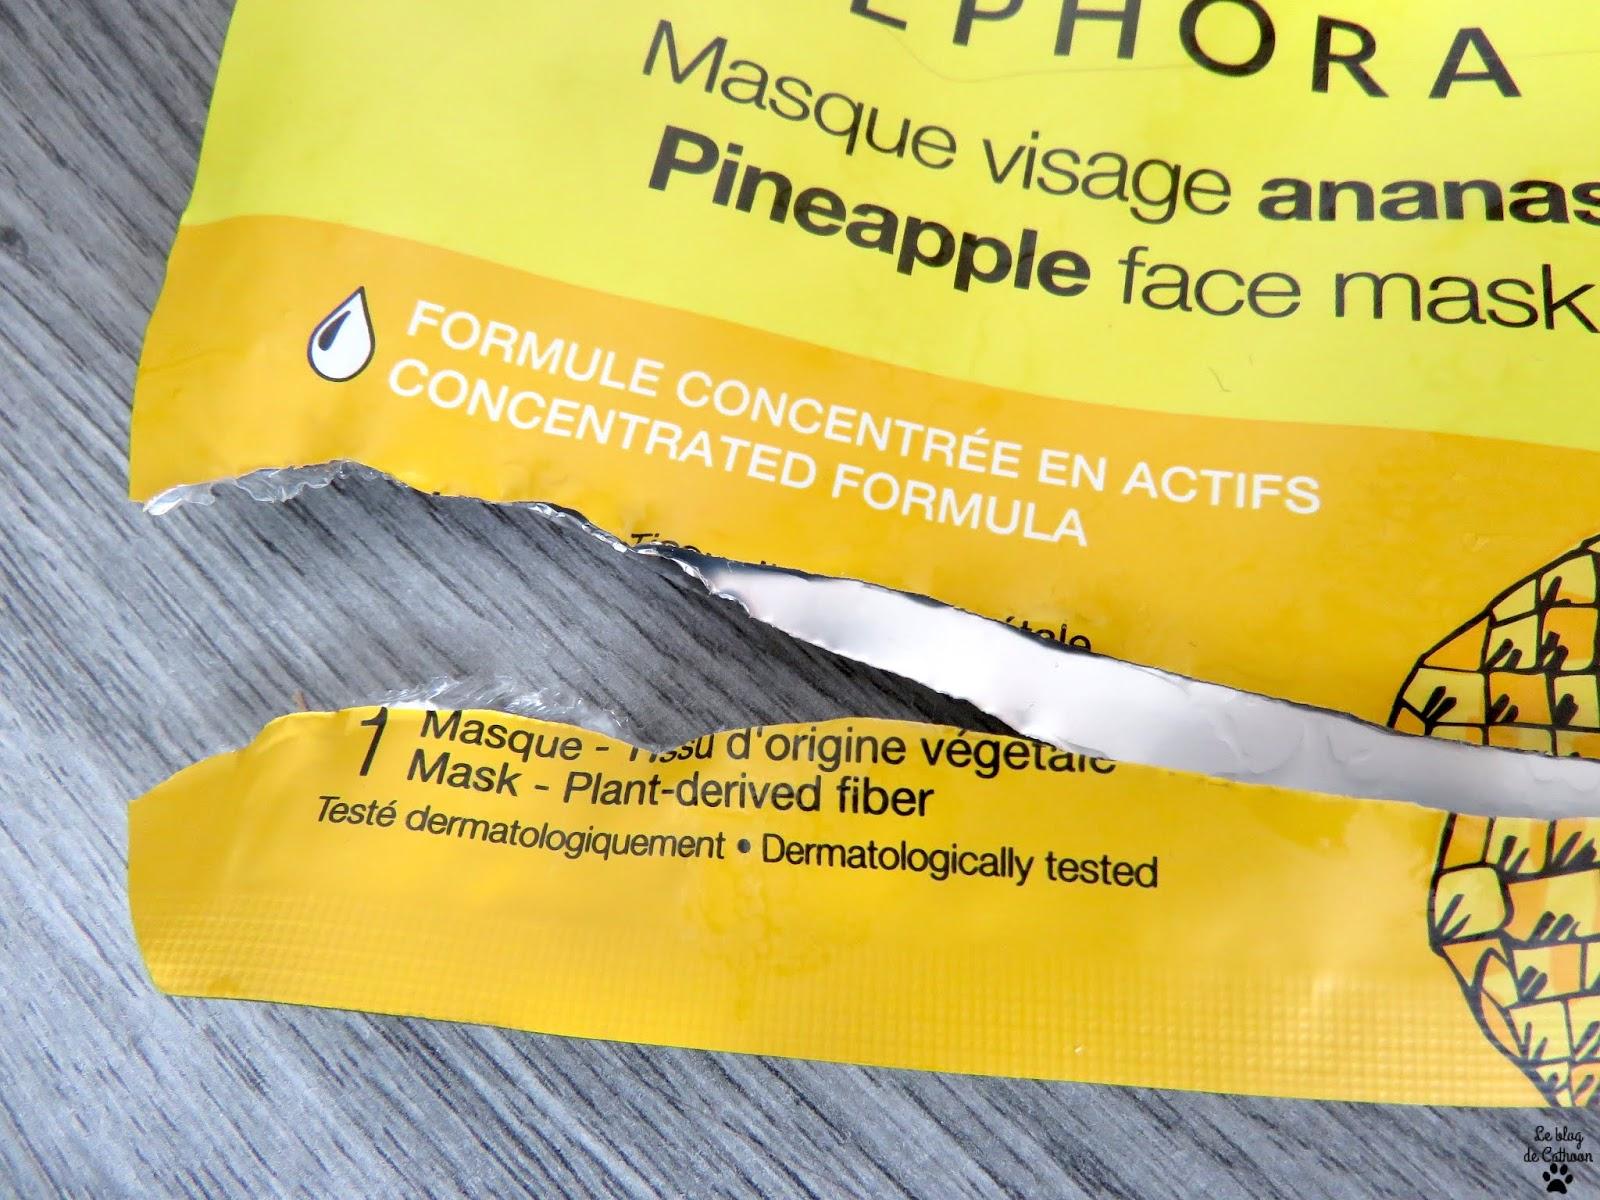 Masque Visage Ananas - Perfecteur Pores Lissant - Sephora